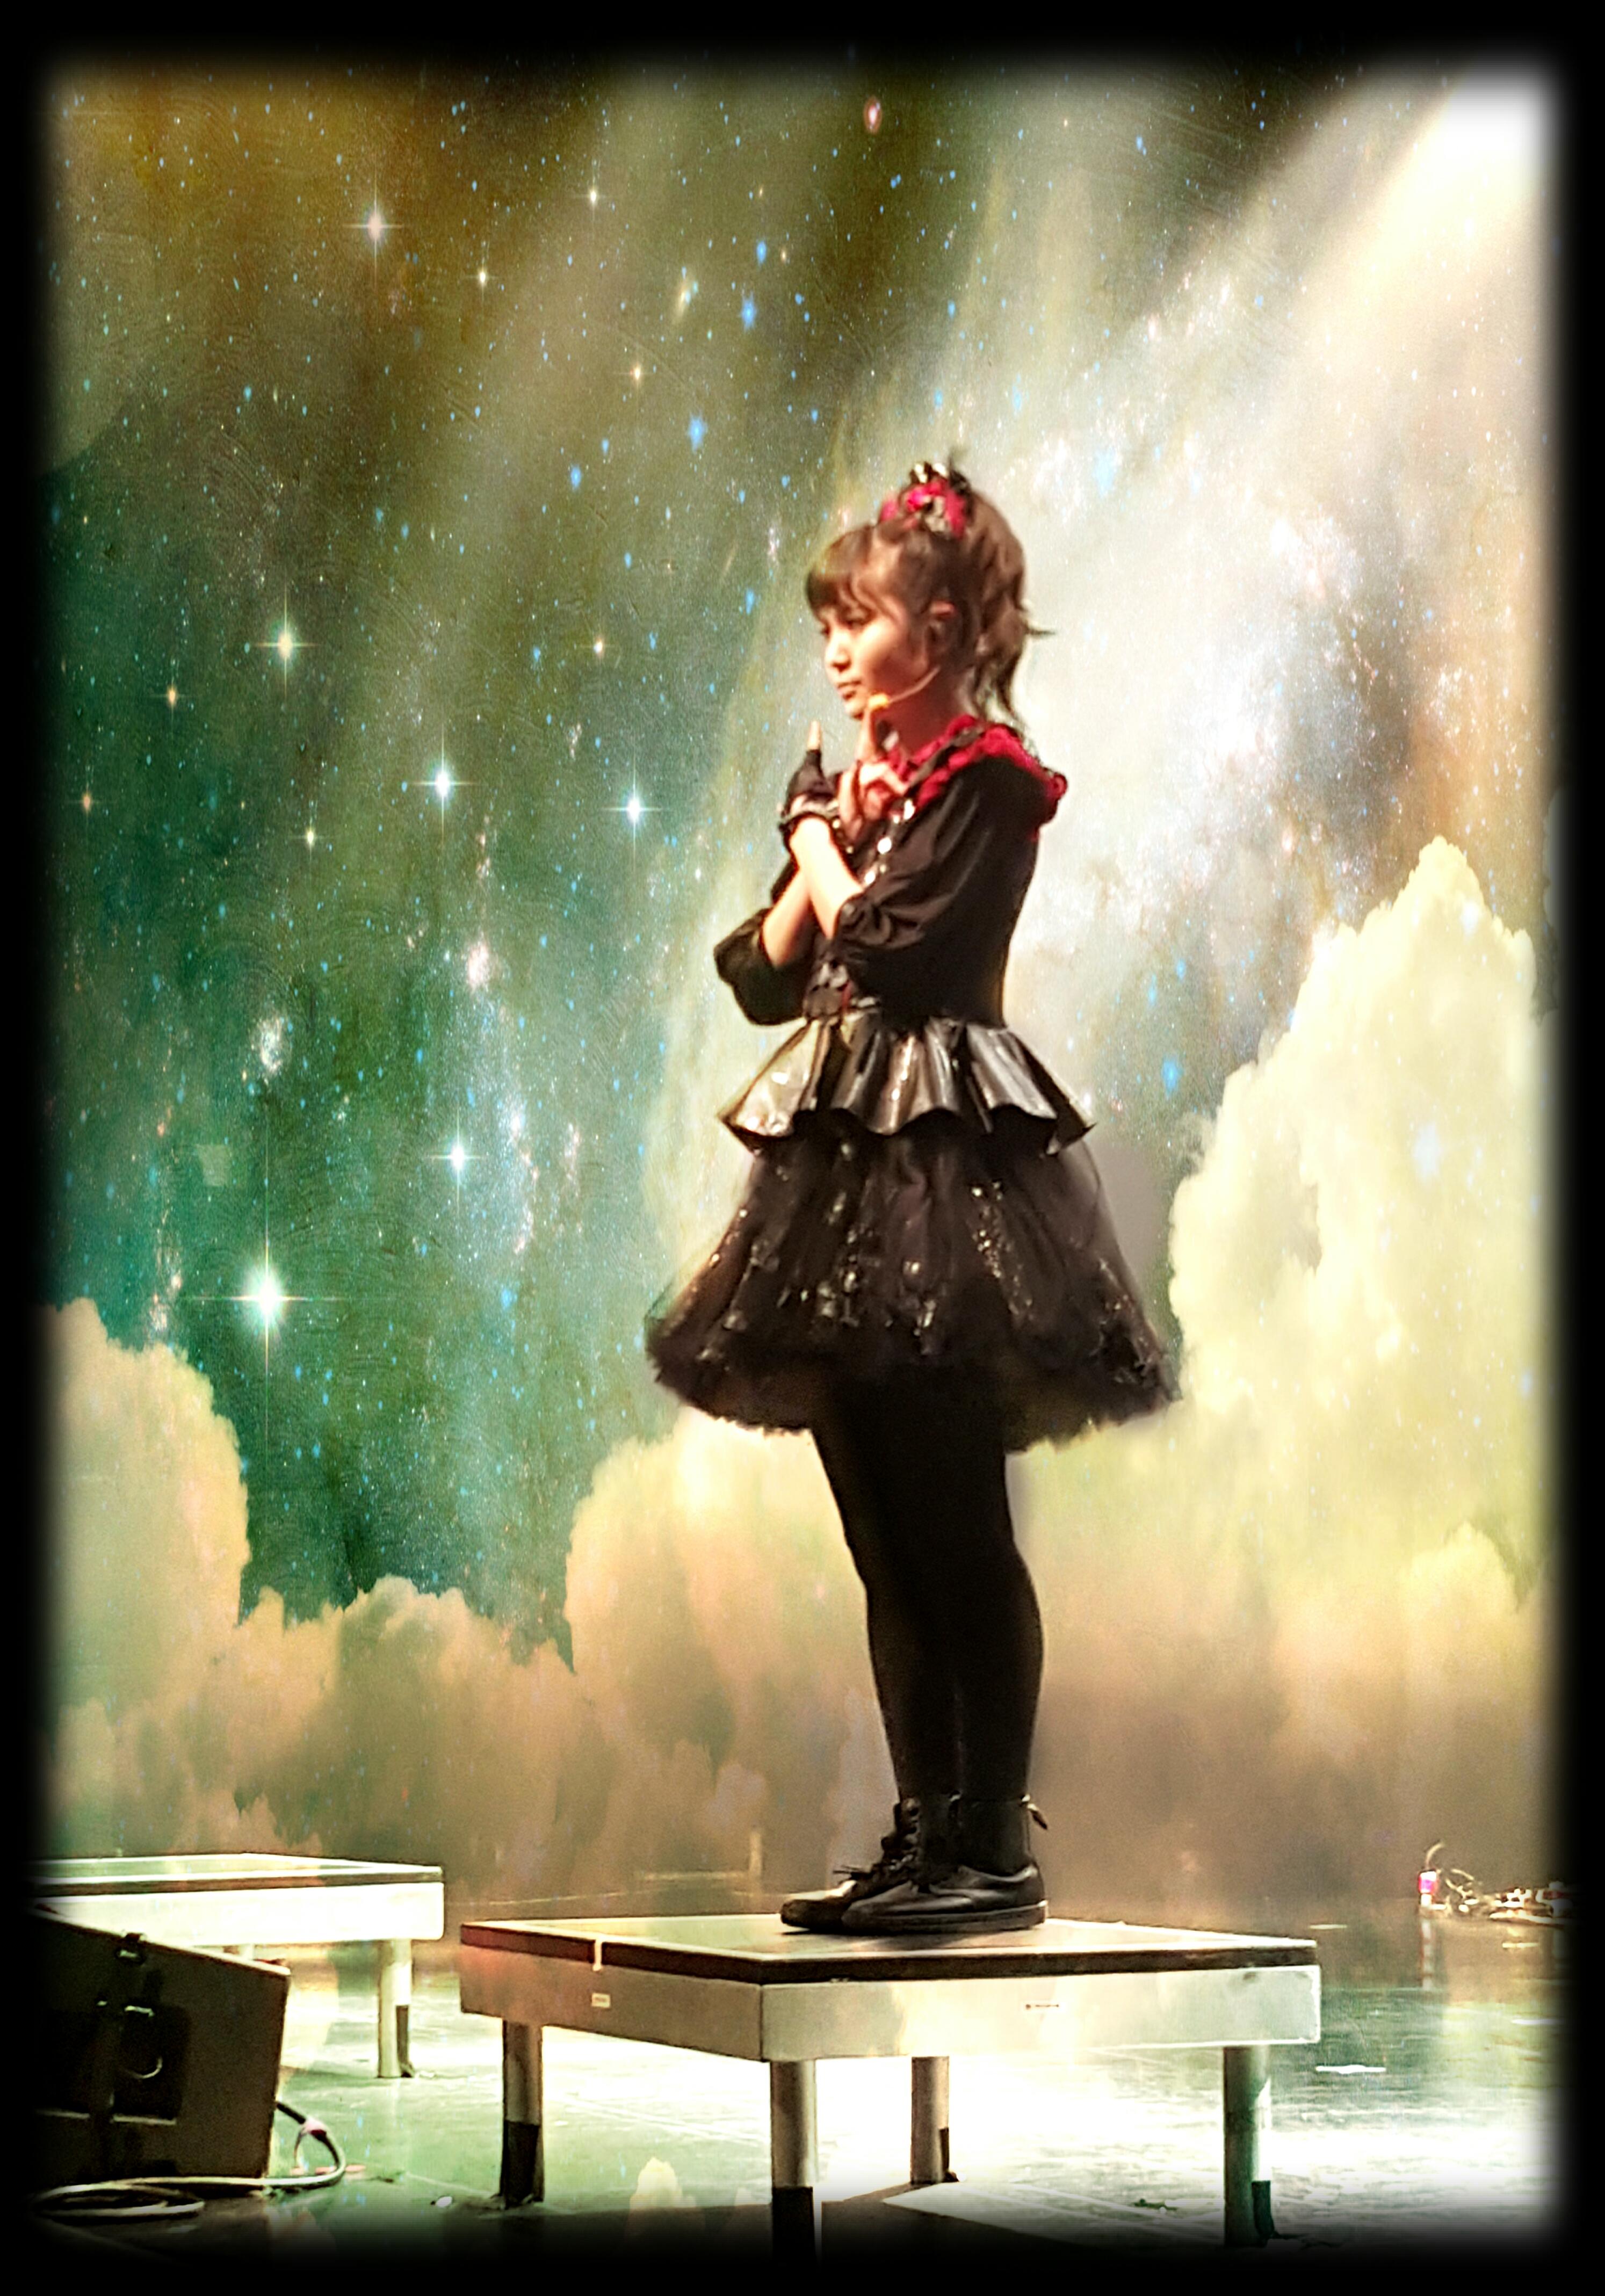 【BABYMETAL】菊地最愛 27の次は28!【MOAMETAL】 [無断転載禁止]©2ch.netYouTube動画>25本 ->画像>810枚